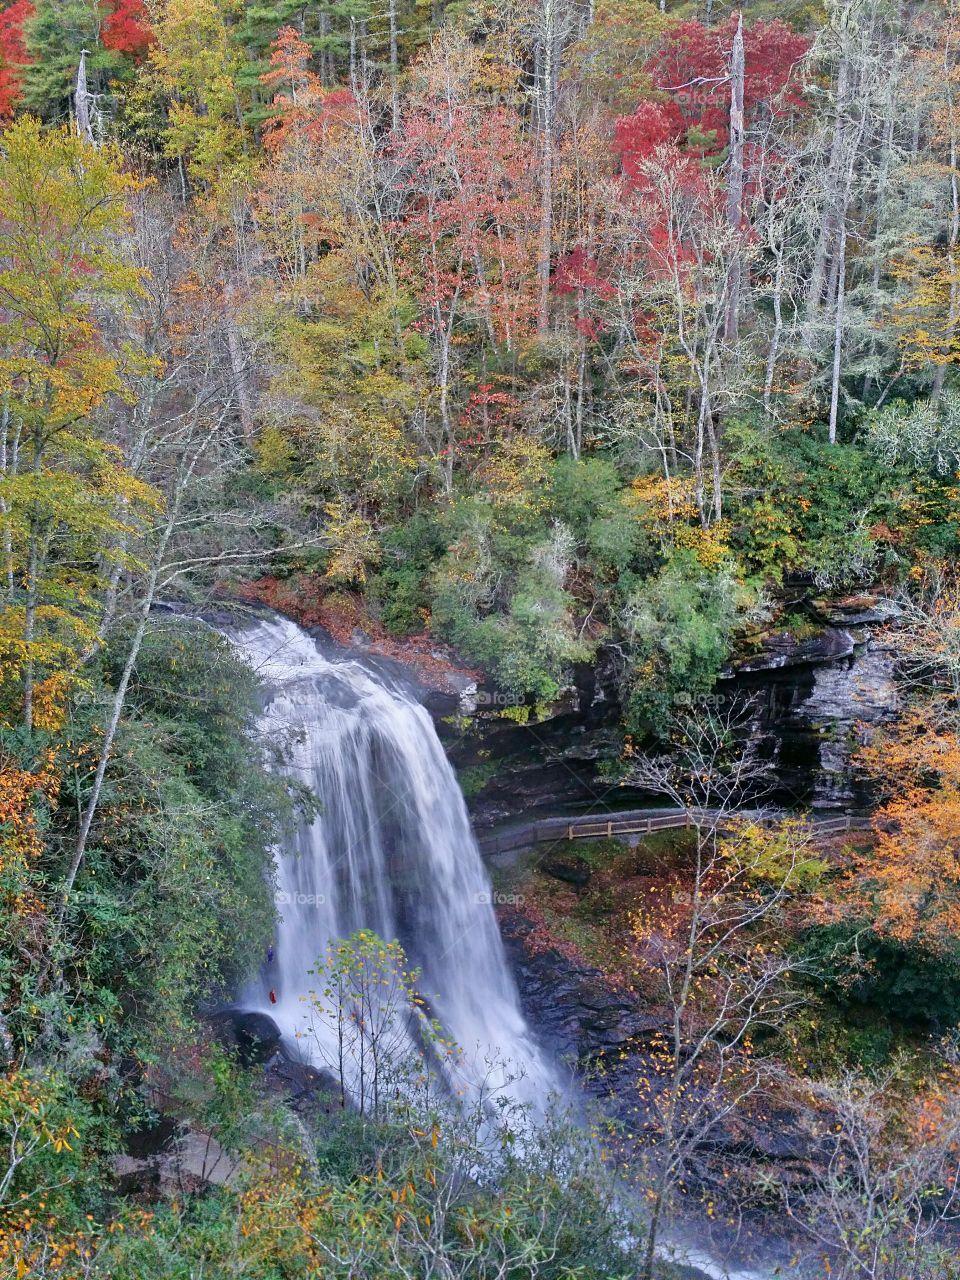 Dry Falls in Autumn. Beautiful Dry Falls near Highlands North Carolina